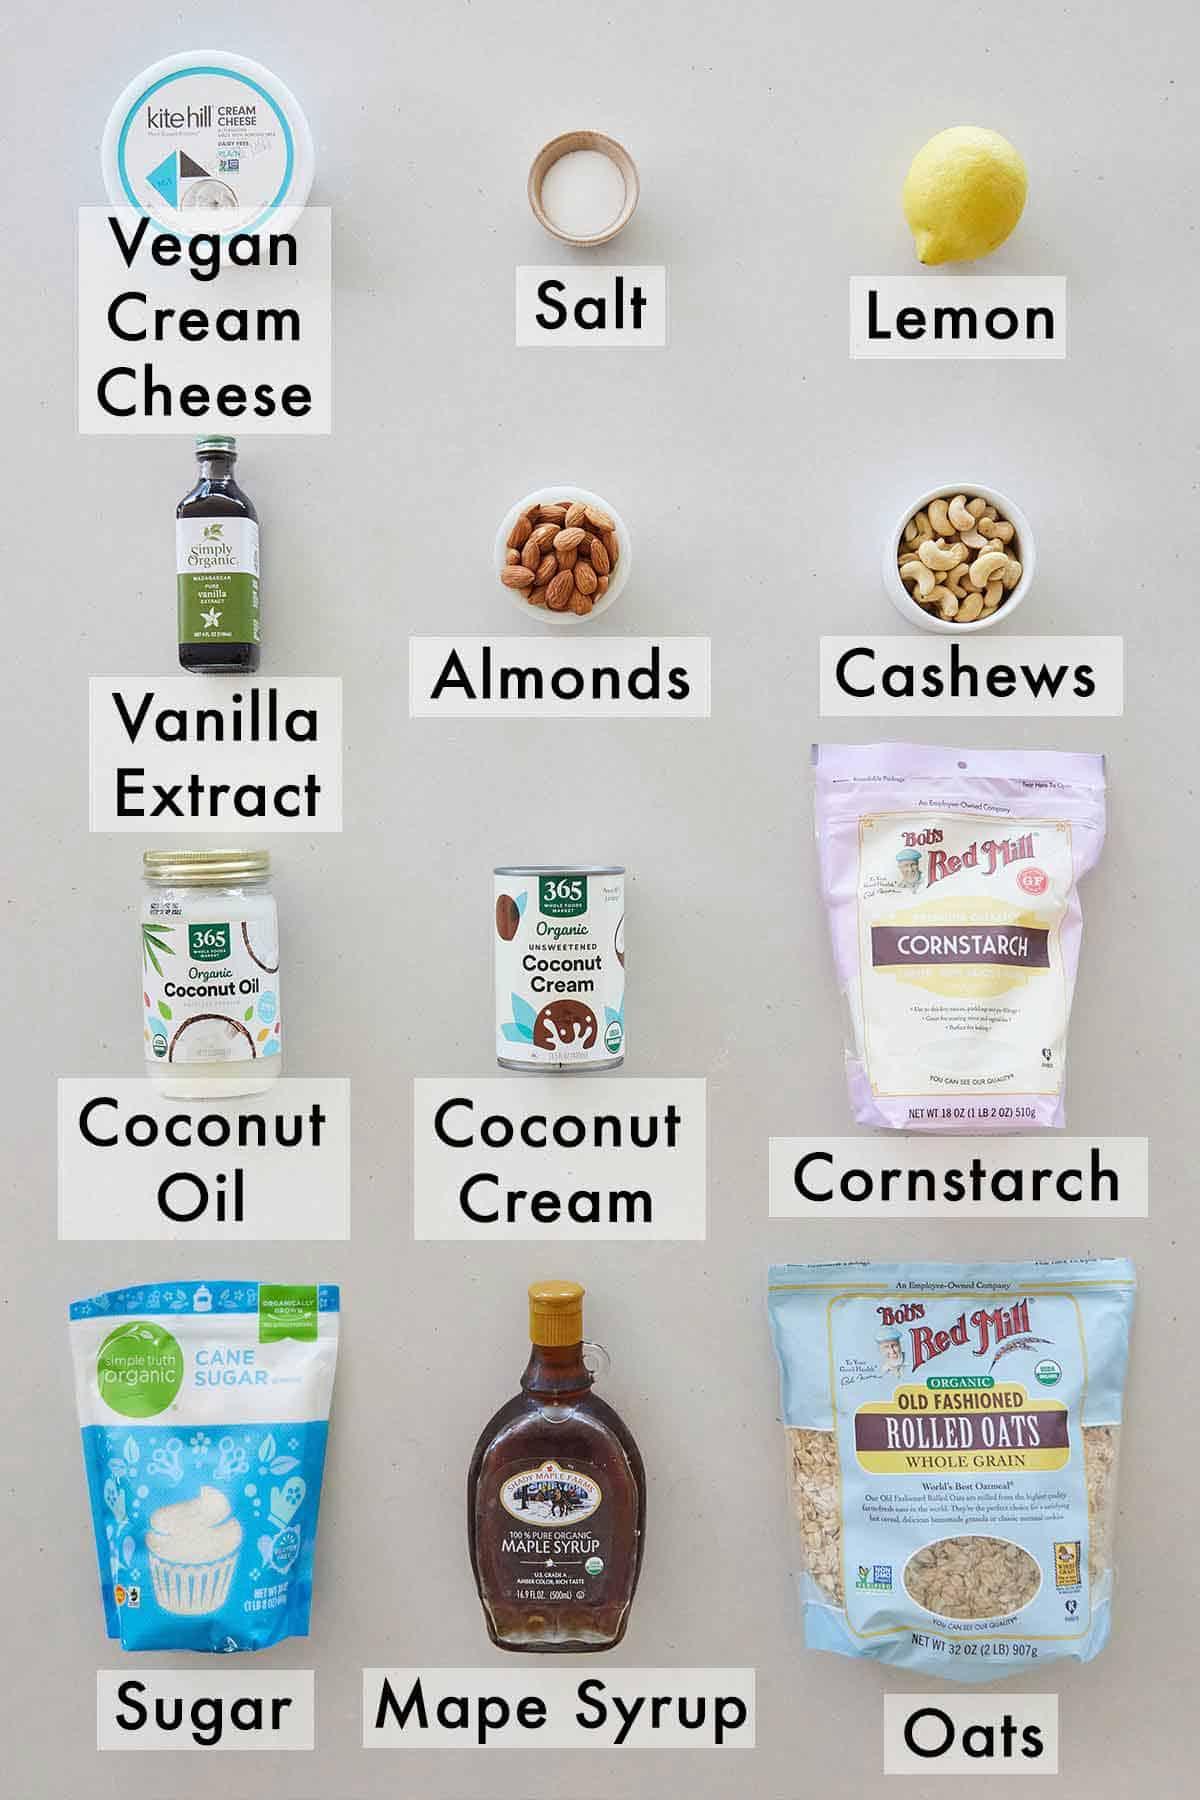 Ingredients needed to make vegan cheesecake.